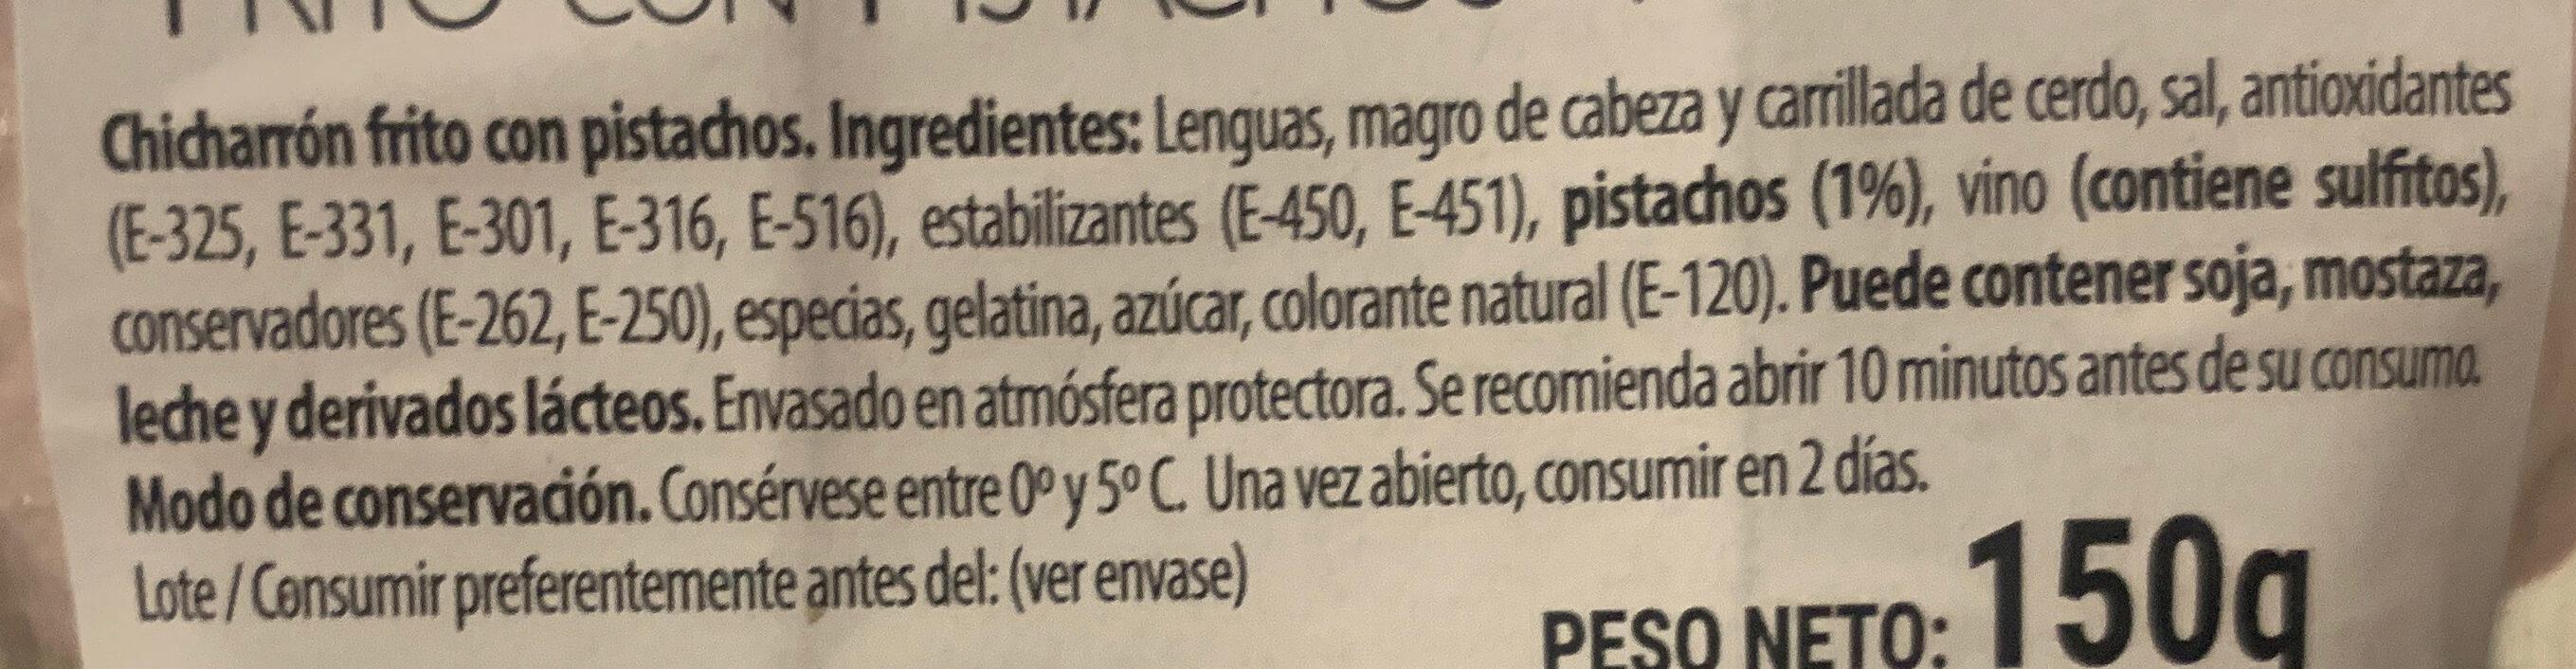 Chicharron frito con pistachos - Ingredientes